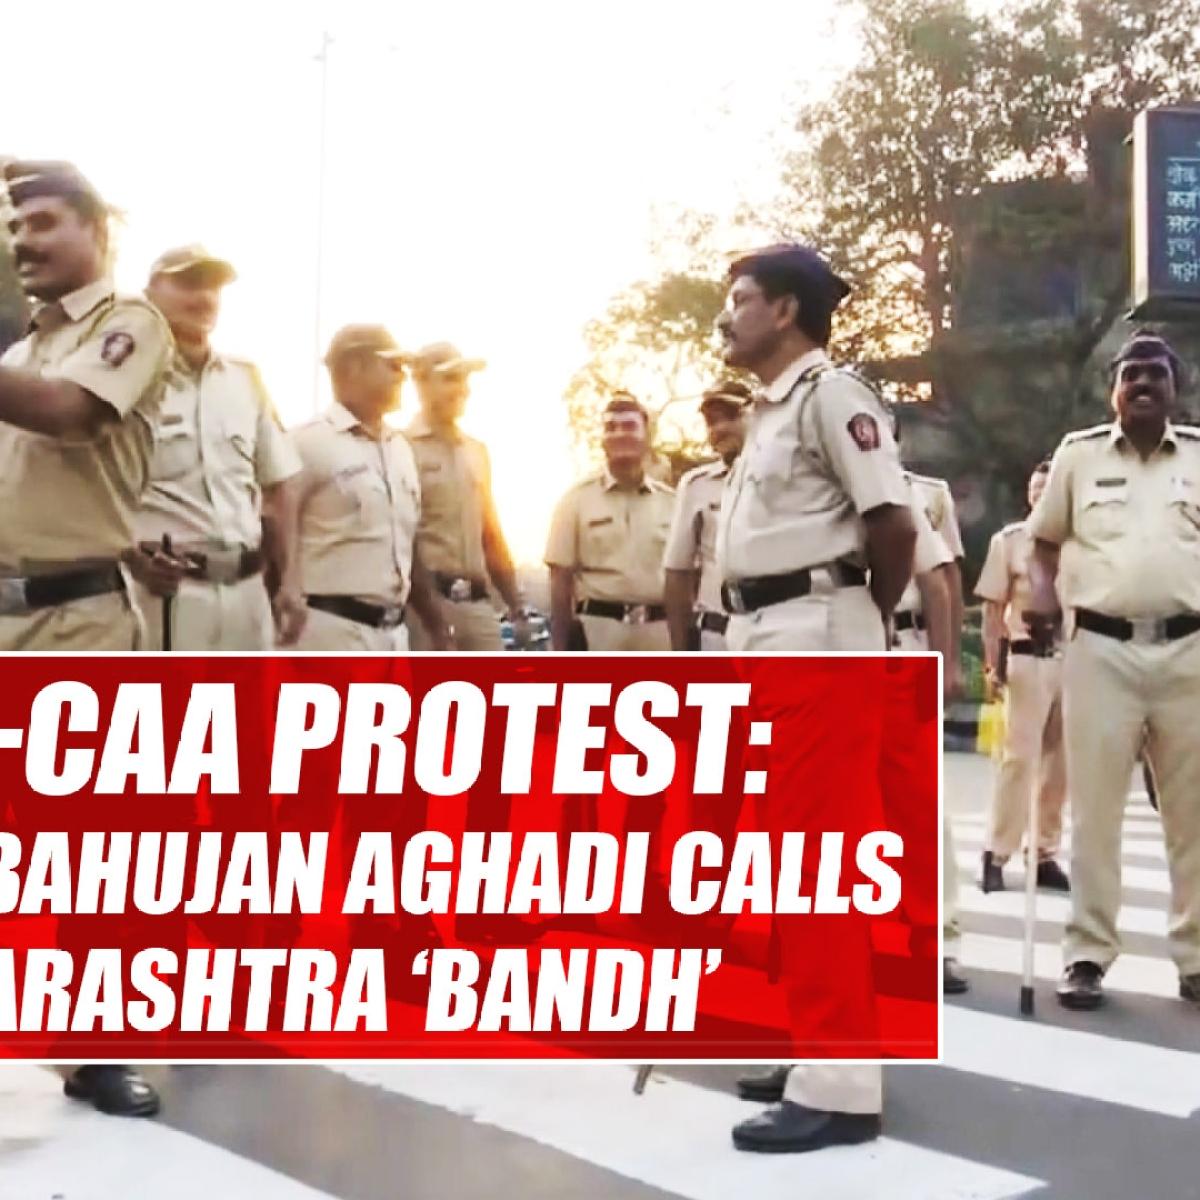 Anti-CAA protest: Vanchit Bahujan Aghadi calls for Maharashtra 'bandh'